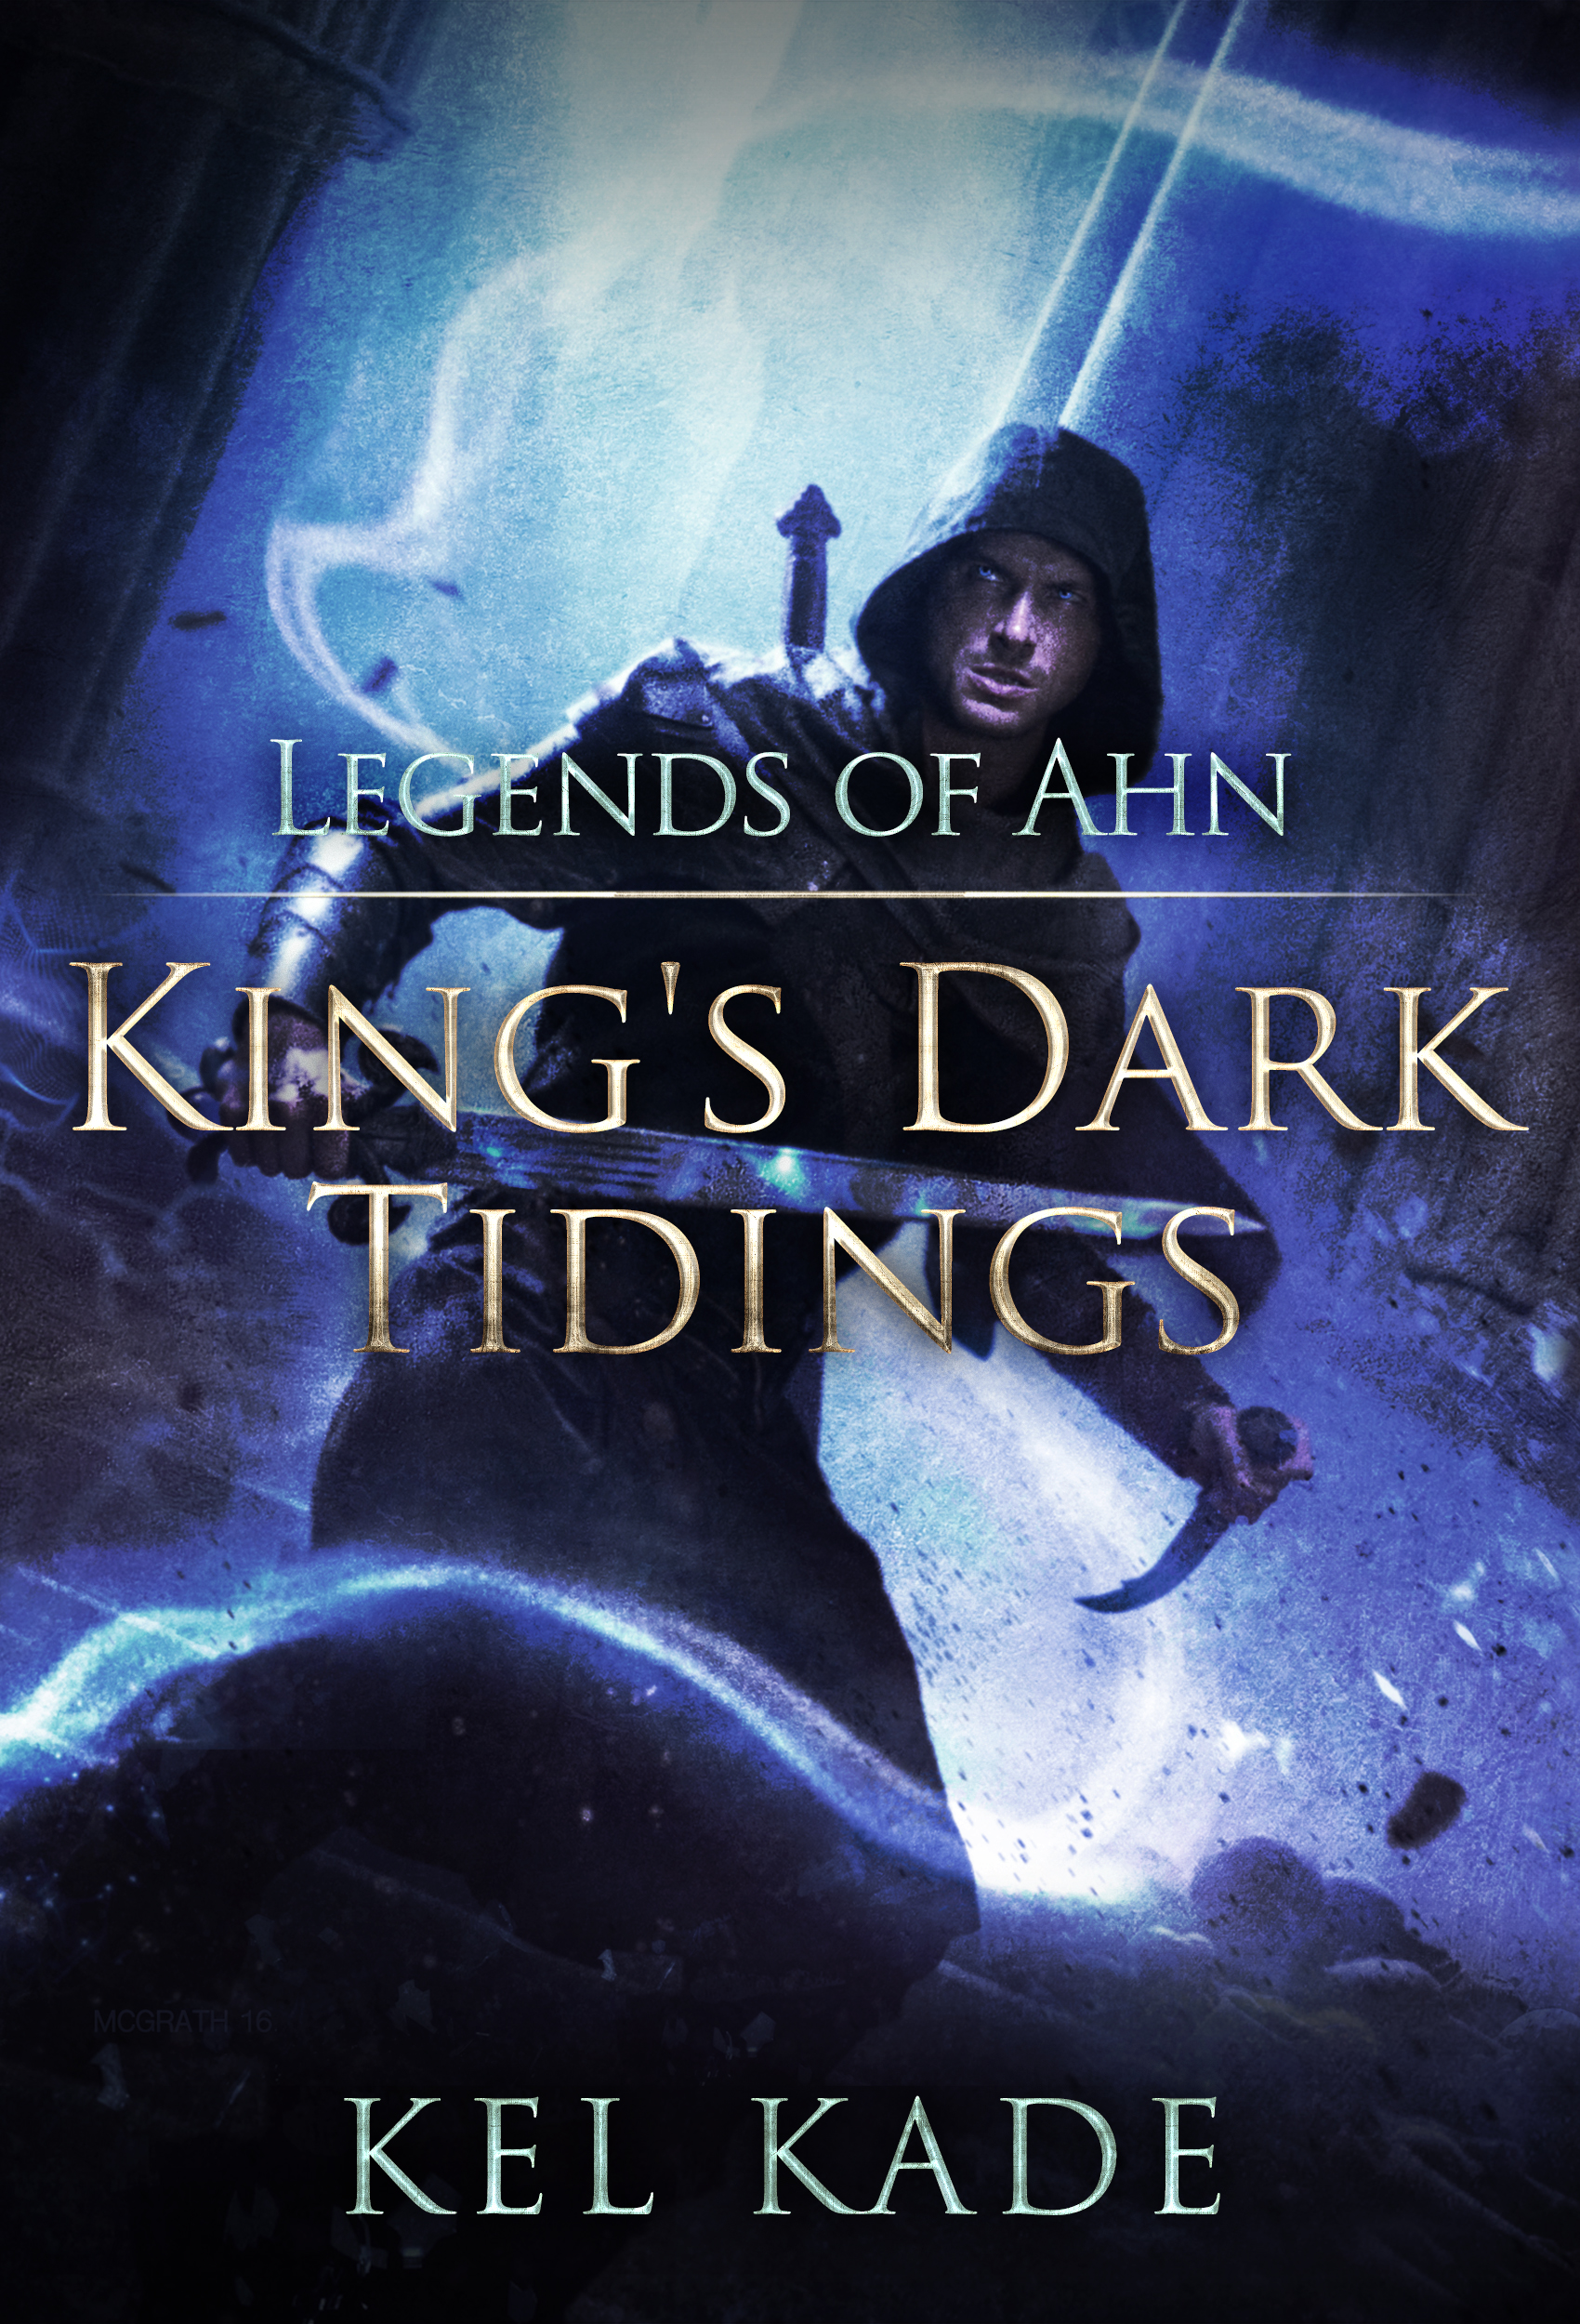 Ebook_B3_KingA?s Dark Tidin gs_1700px_2500px_300DPI-4.jpg